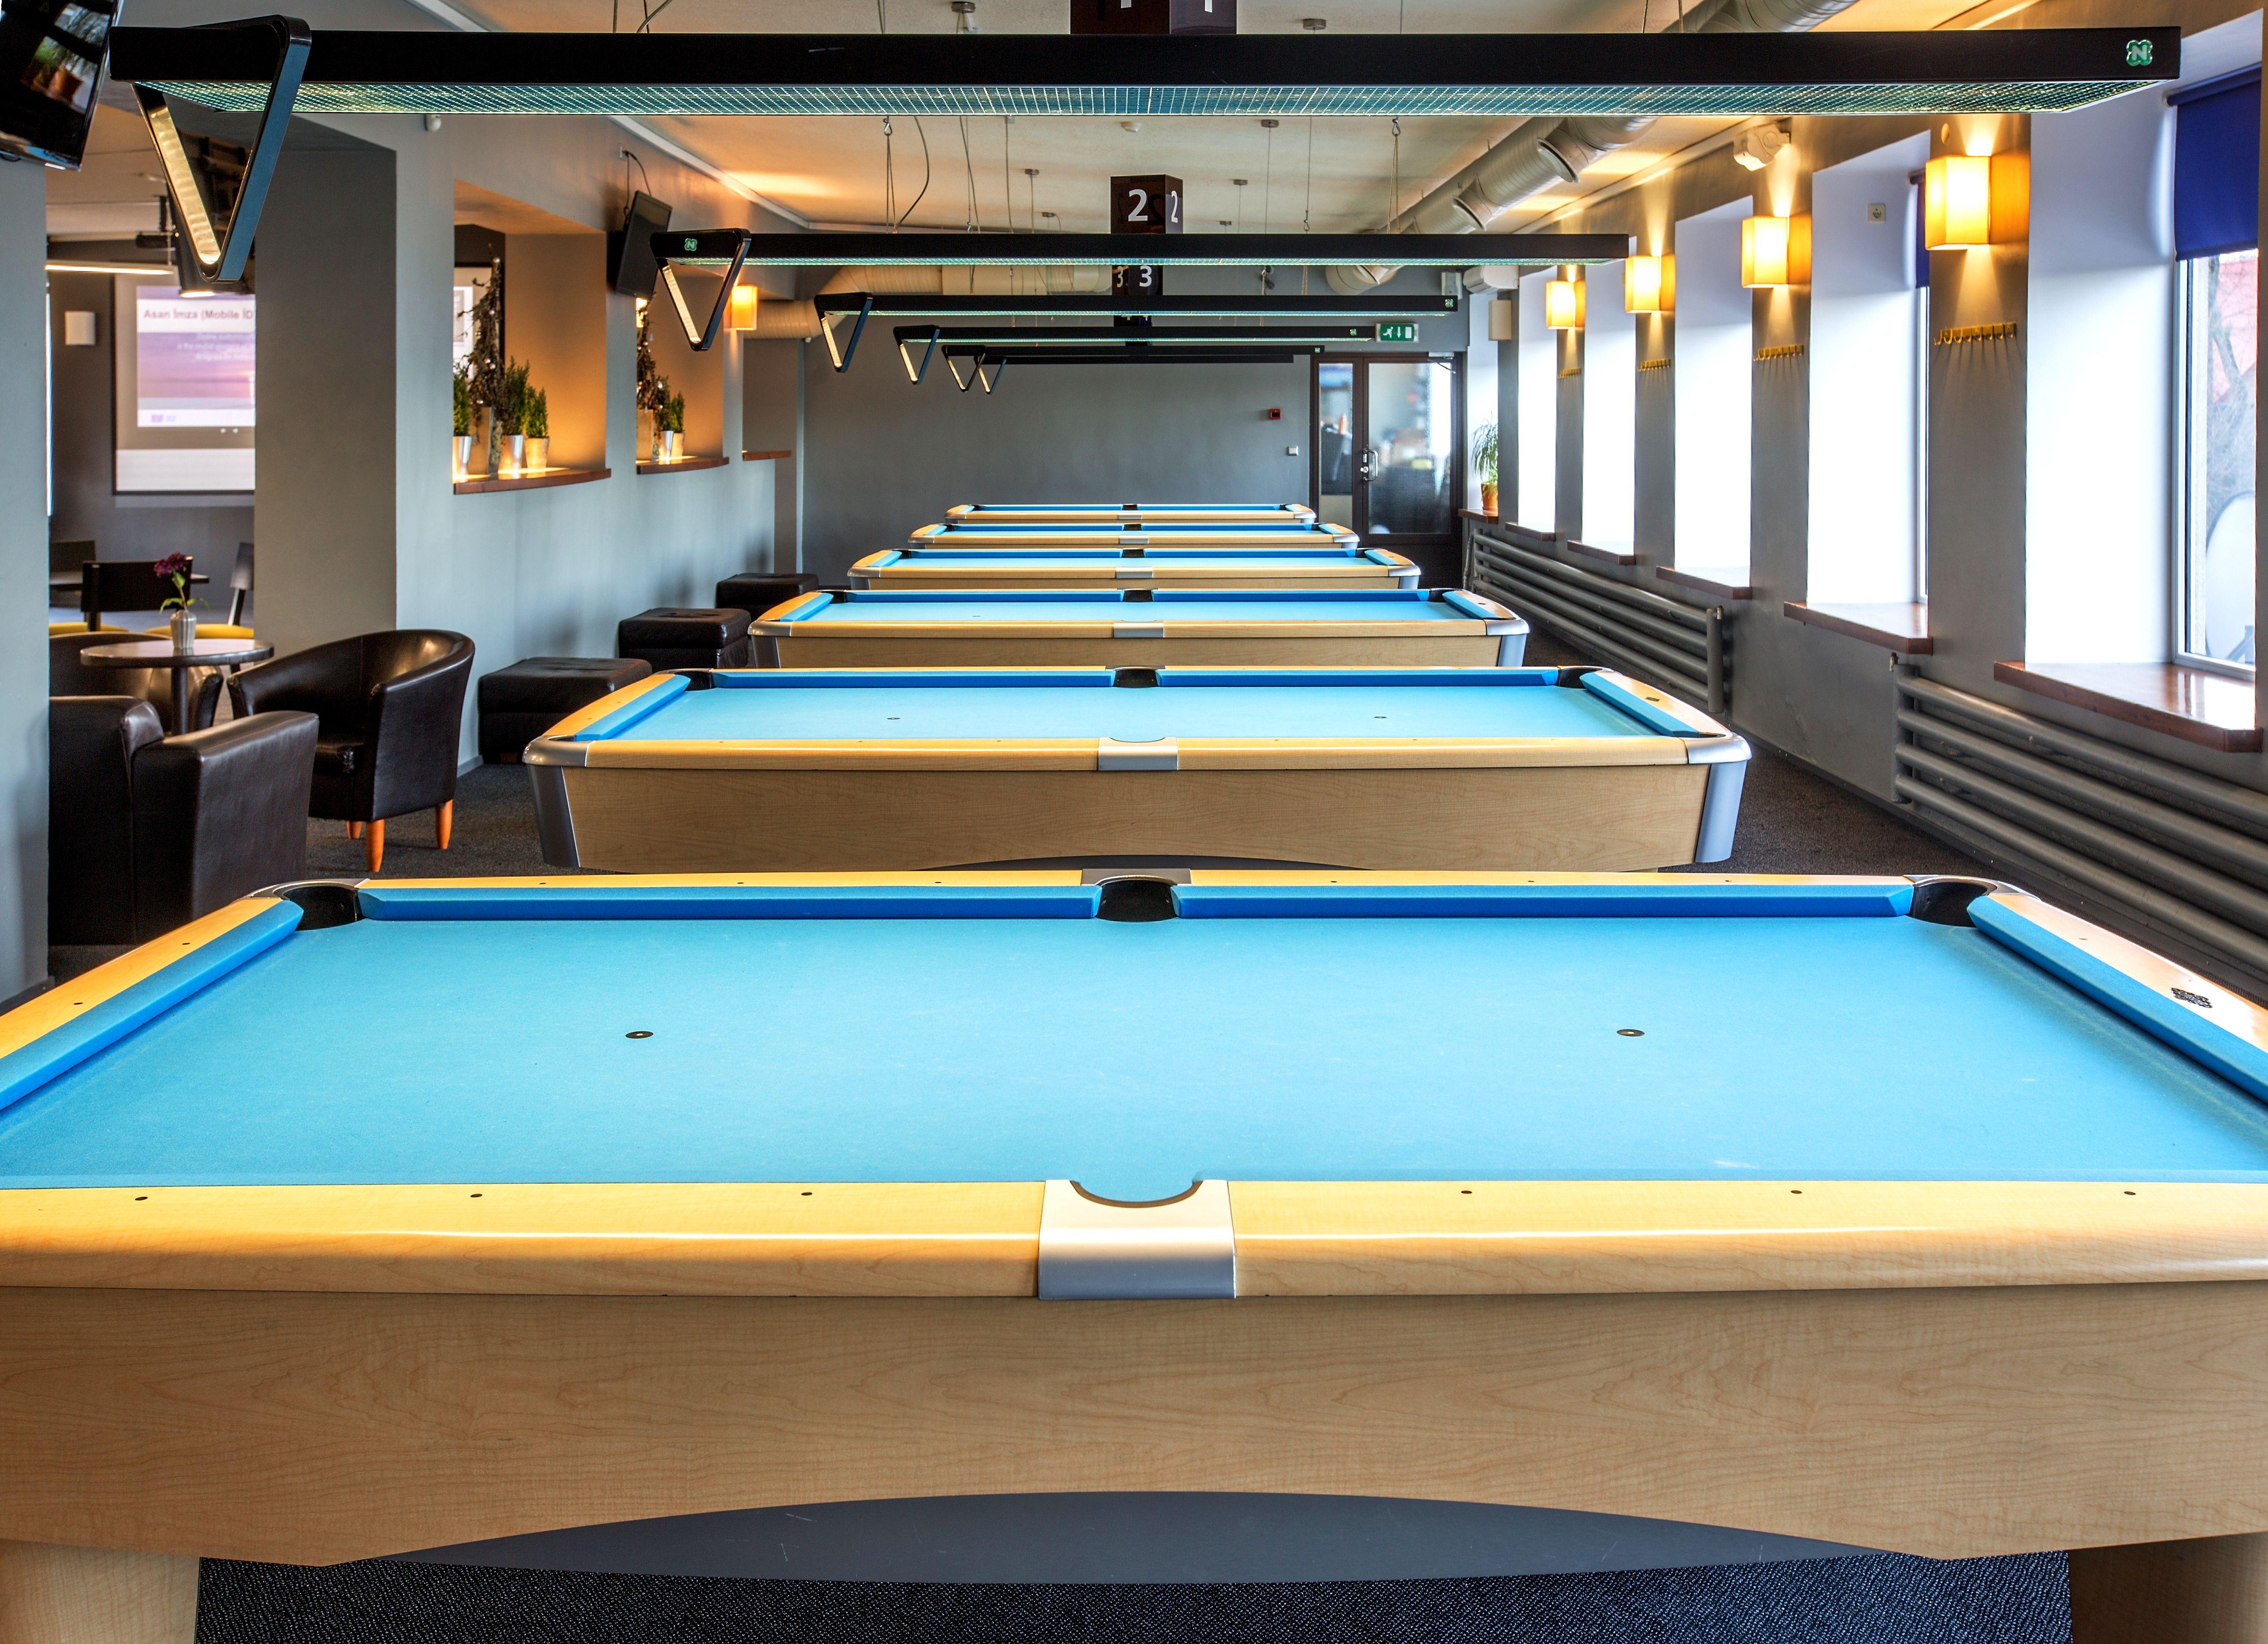 Hiiupubi - Tallinn , bars and pubs in tallinn, pool, snooker ...